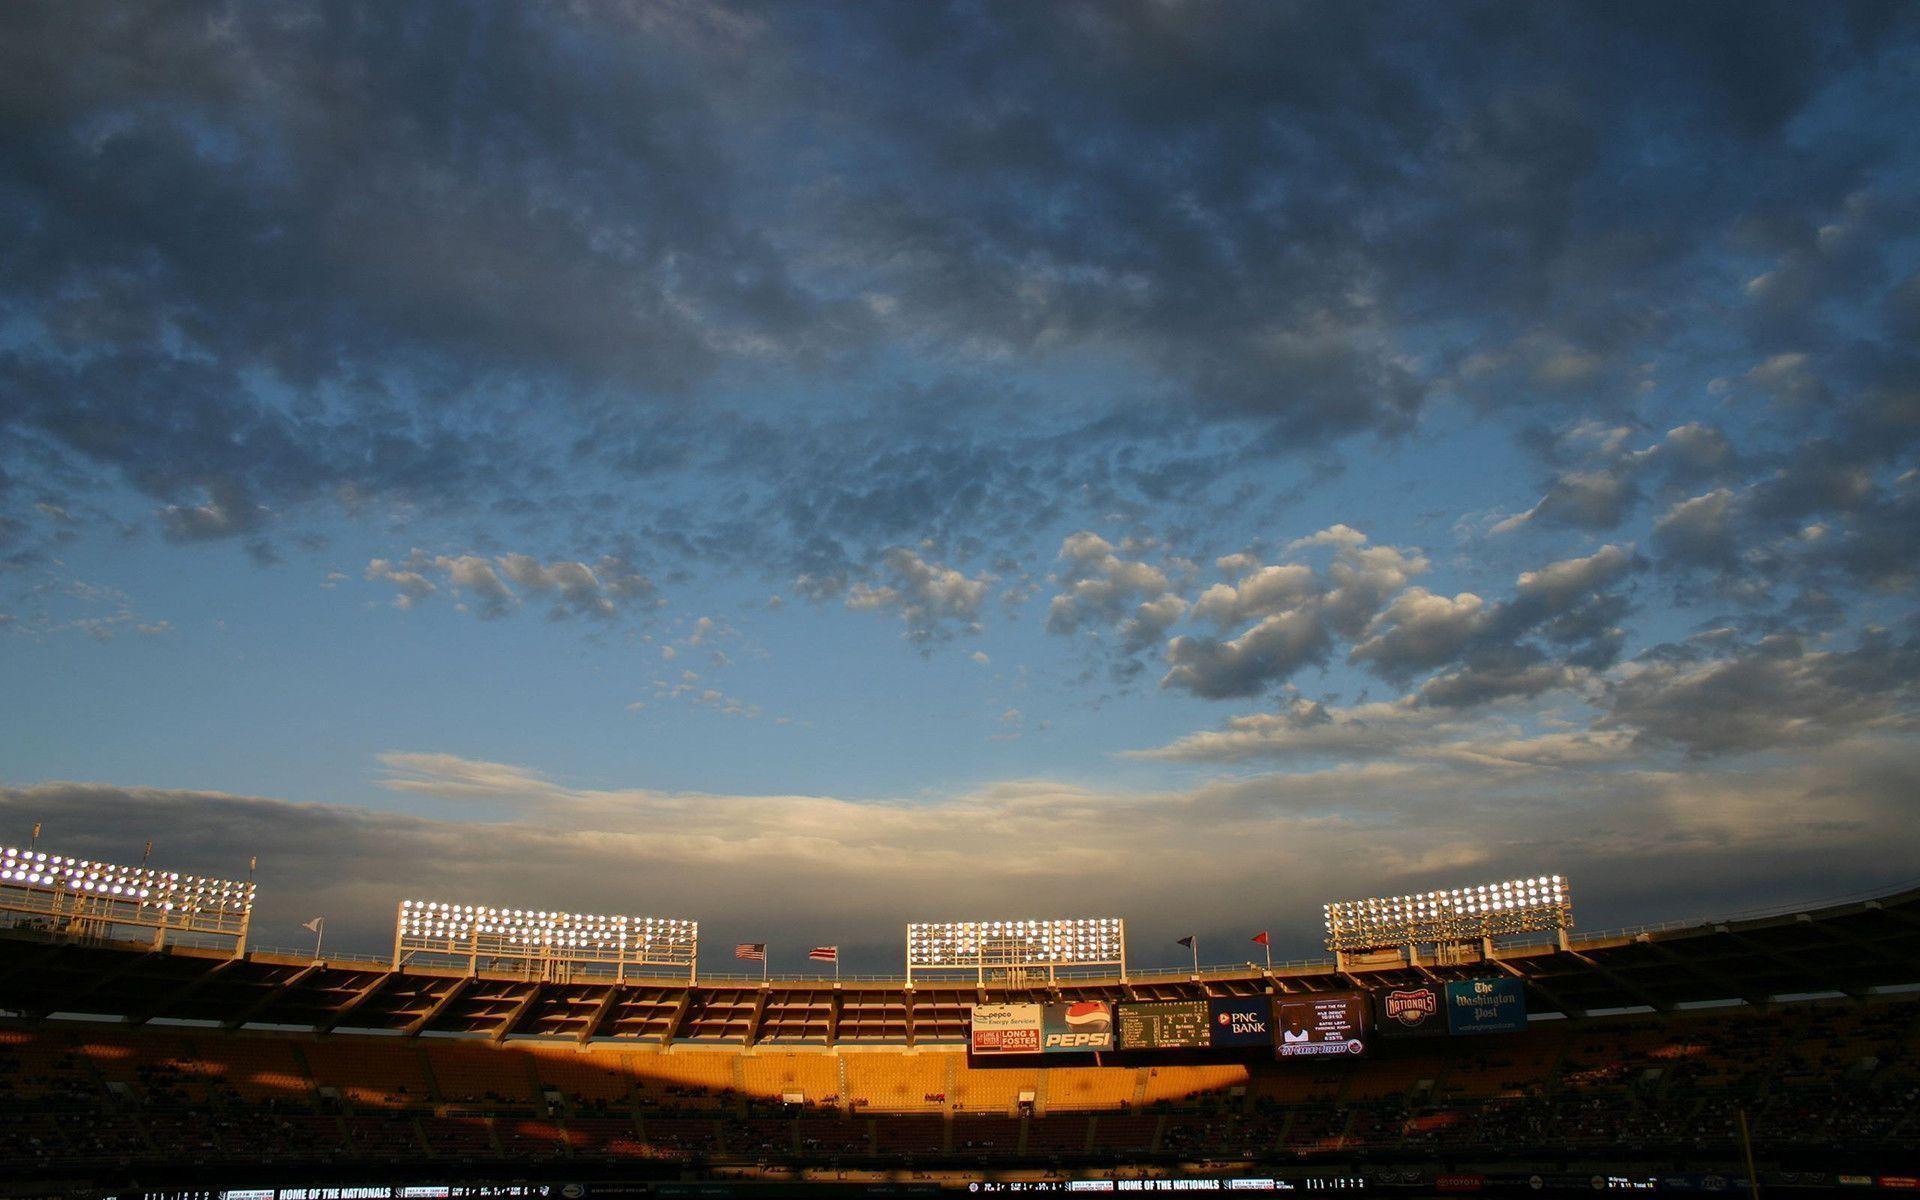 Hd Baseball Stadium Wallpaper